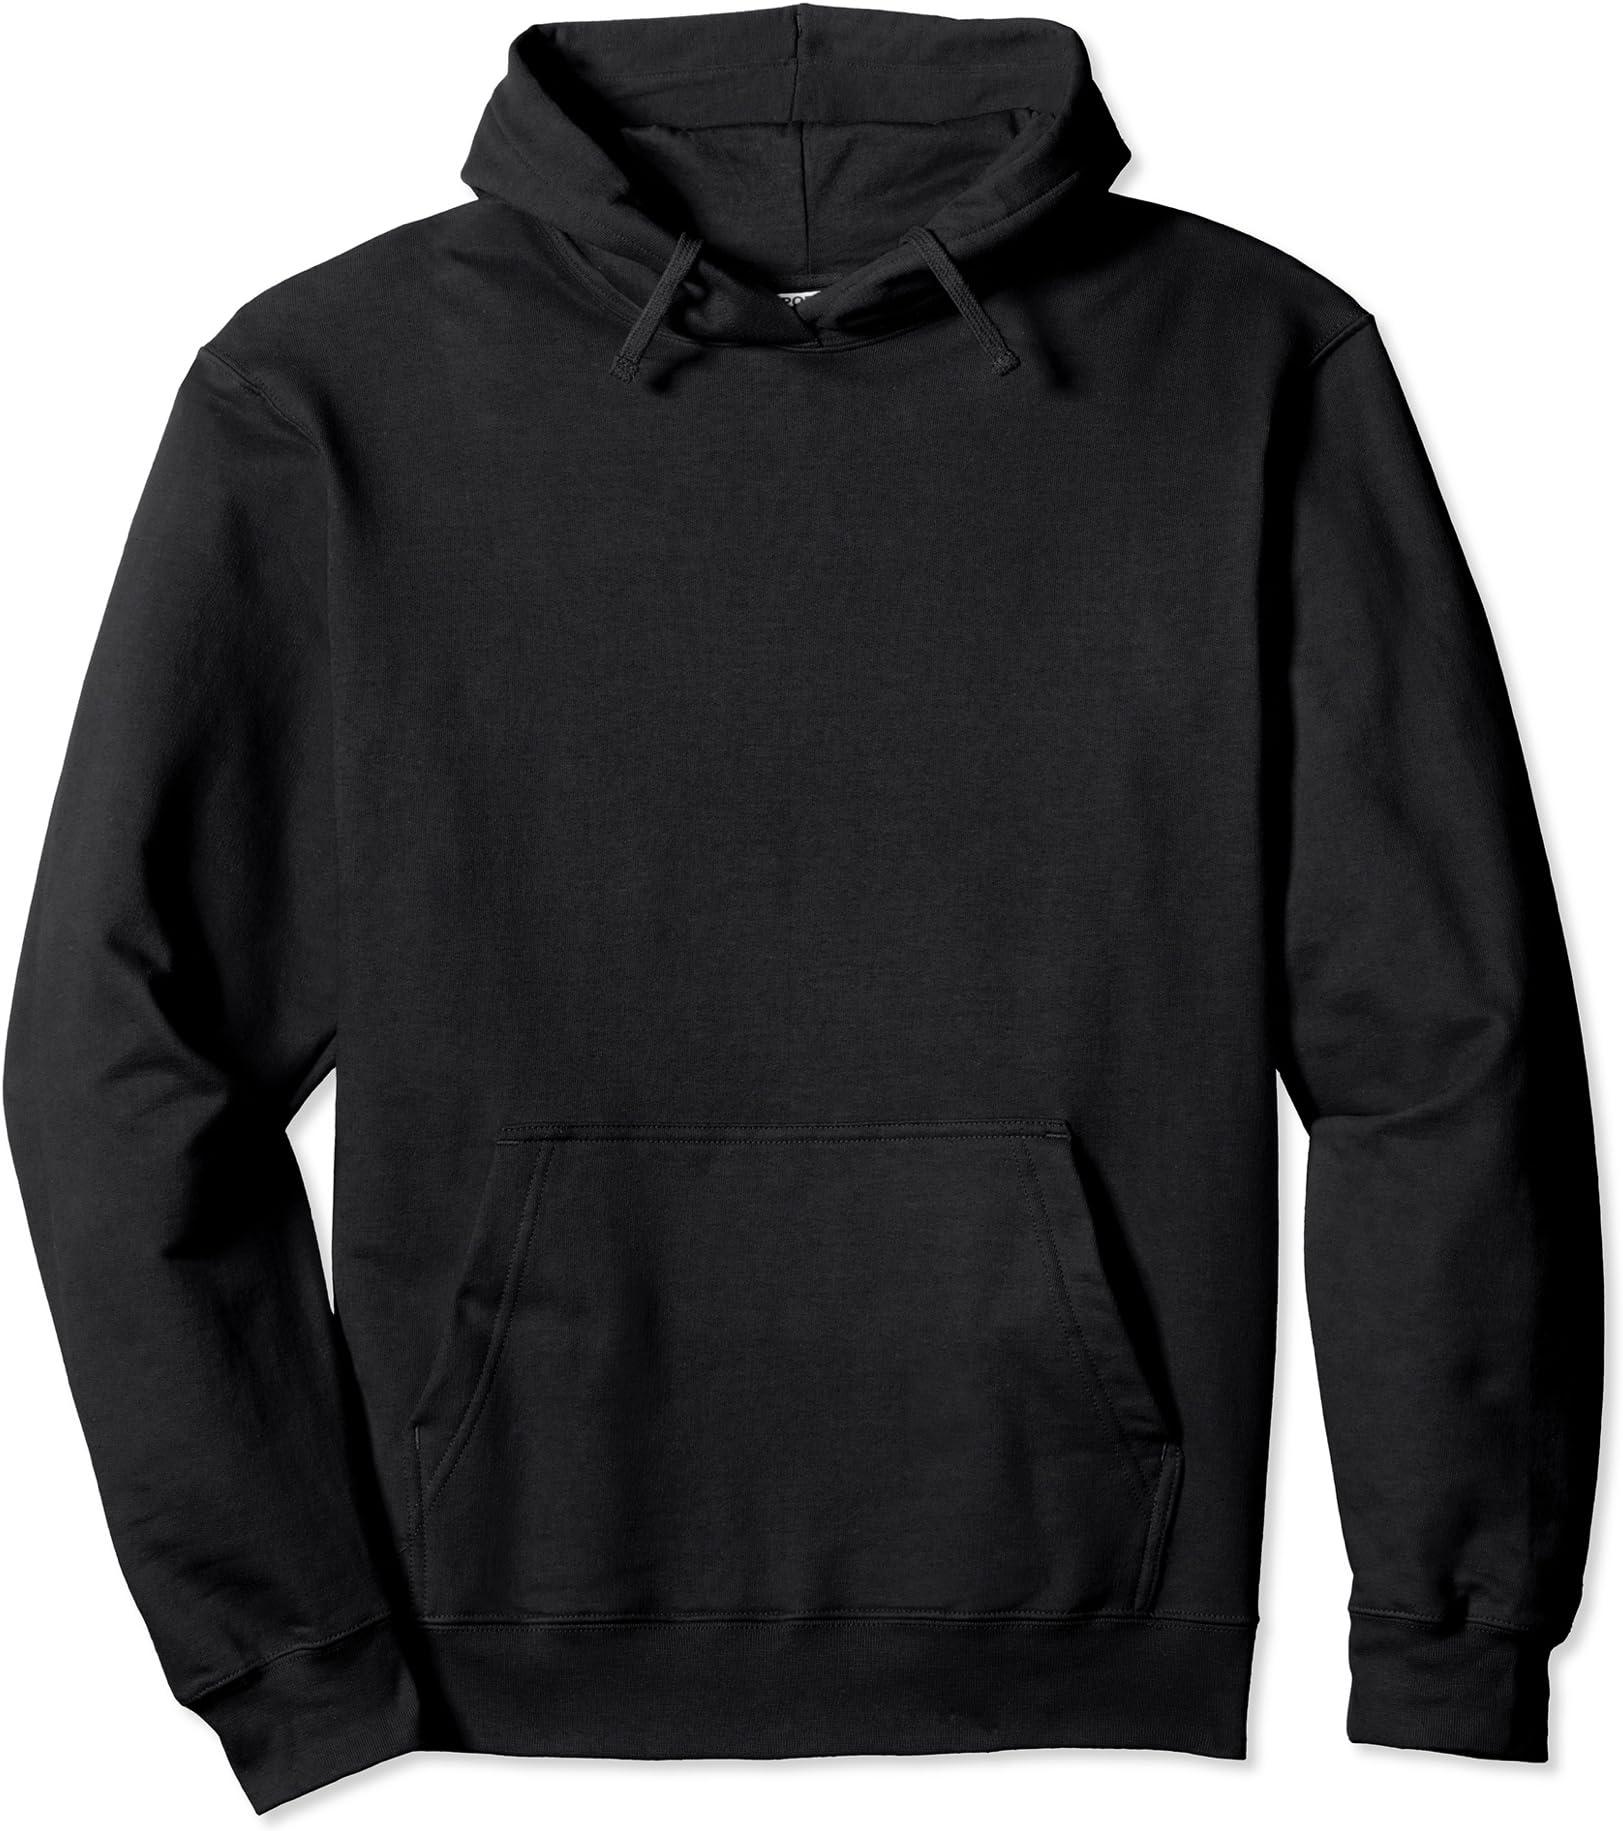 Sweatshirt LightRed Softball Heartbeat Tee Shirt Hoodie